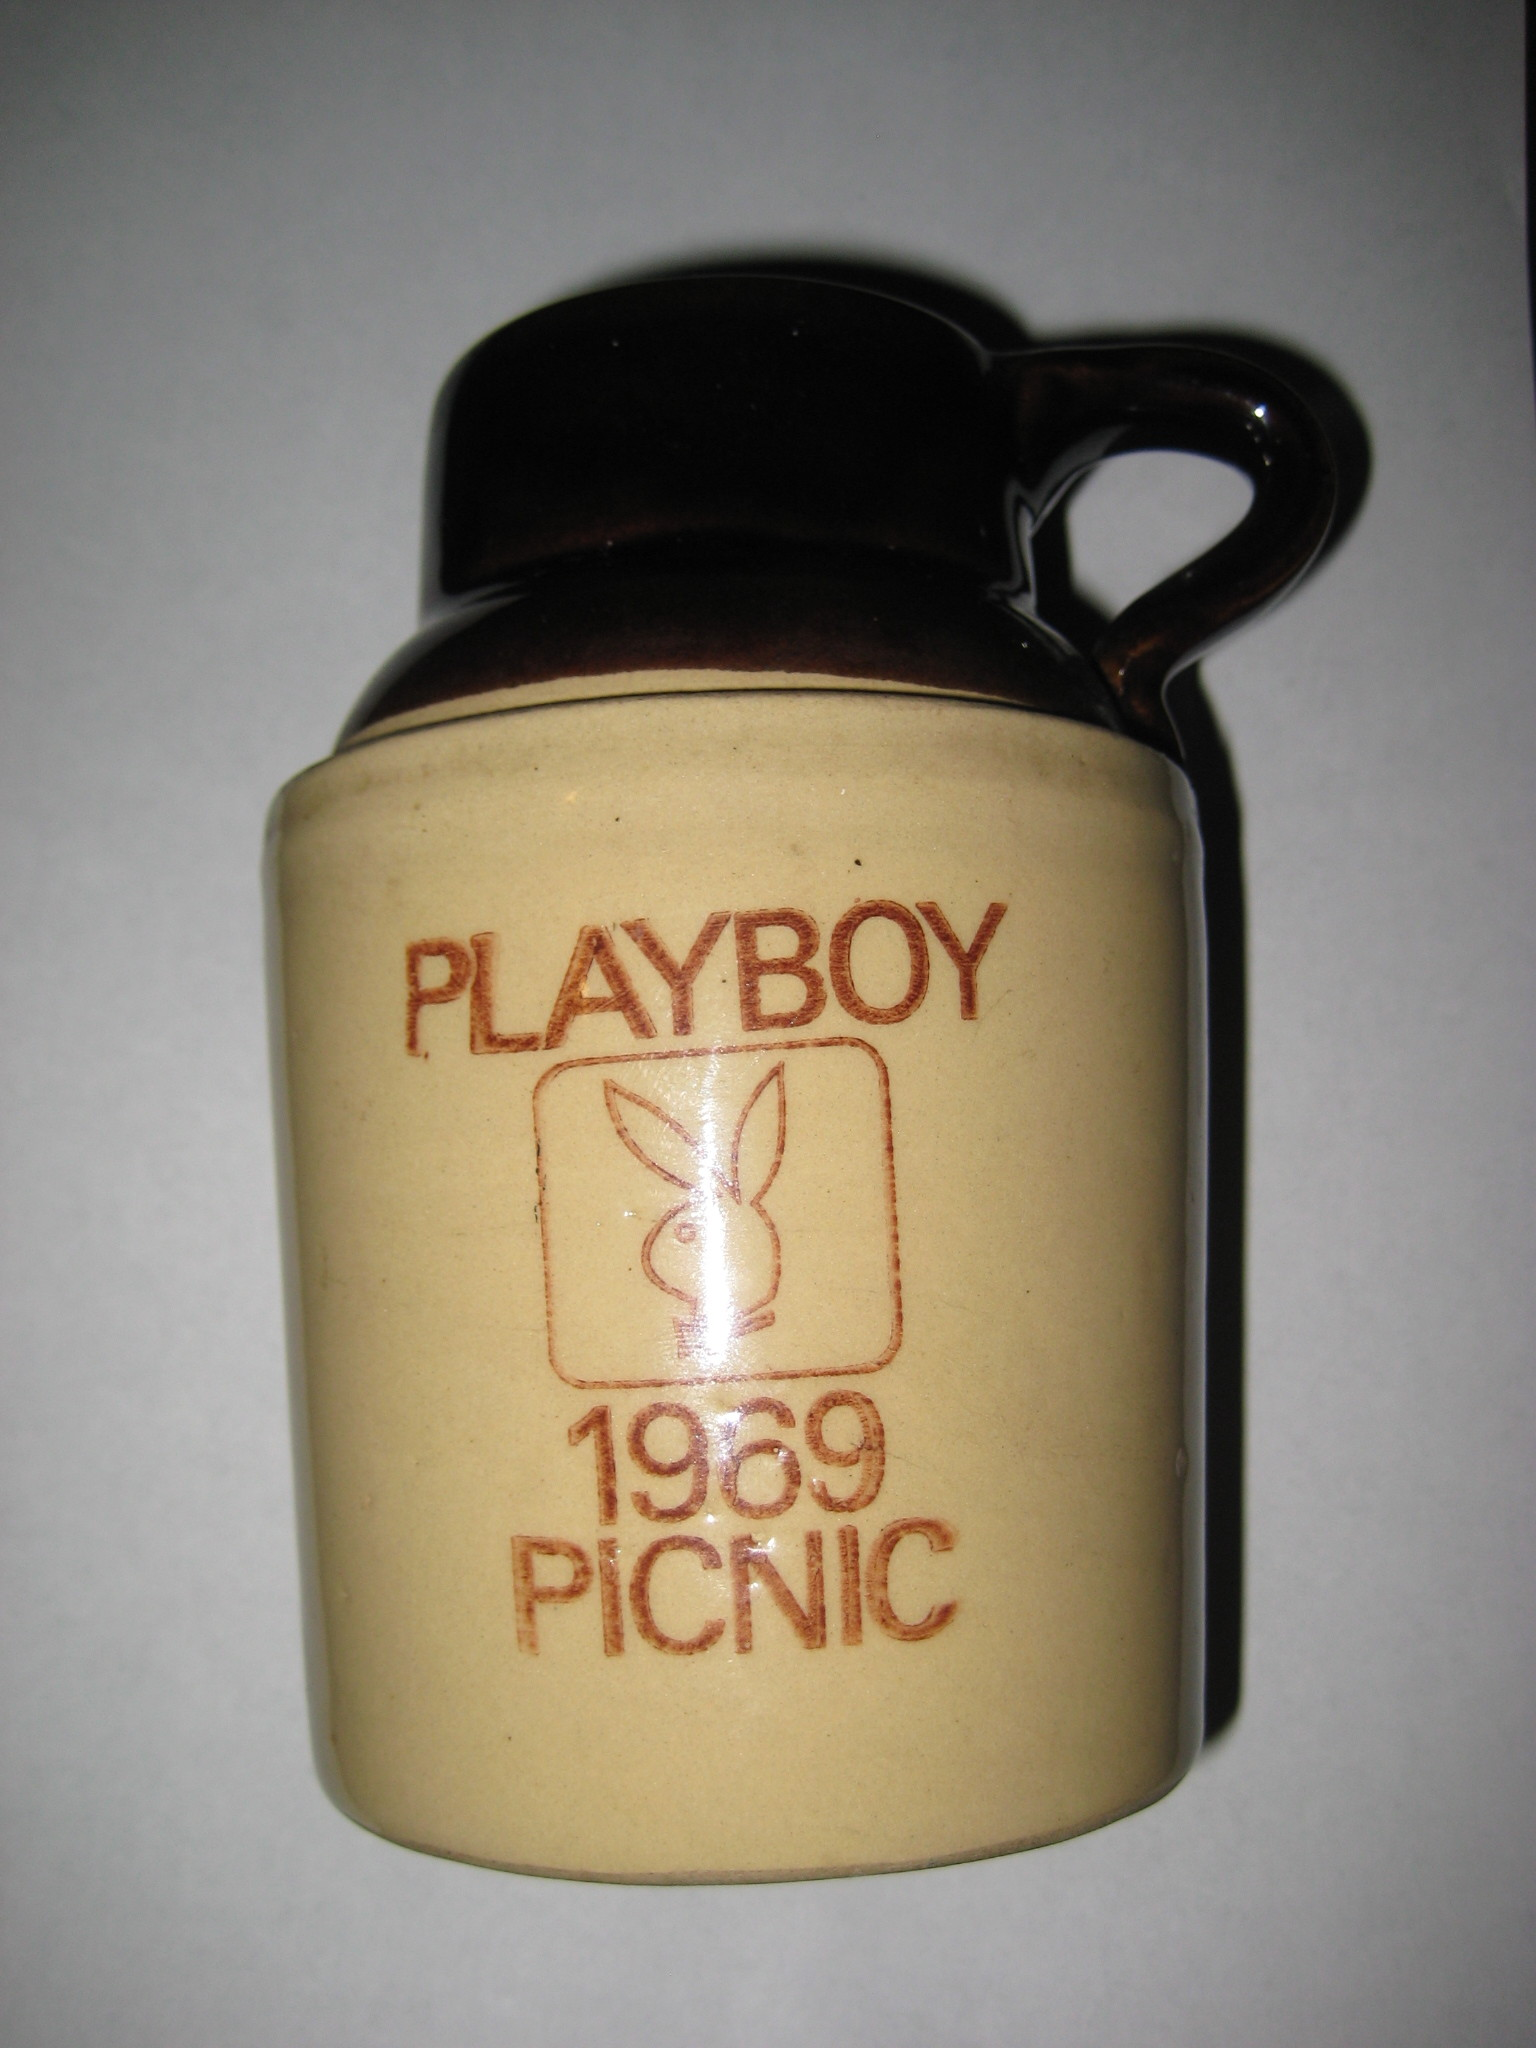 Playboy 1969 Picnic